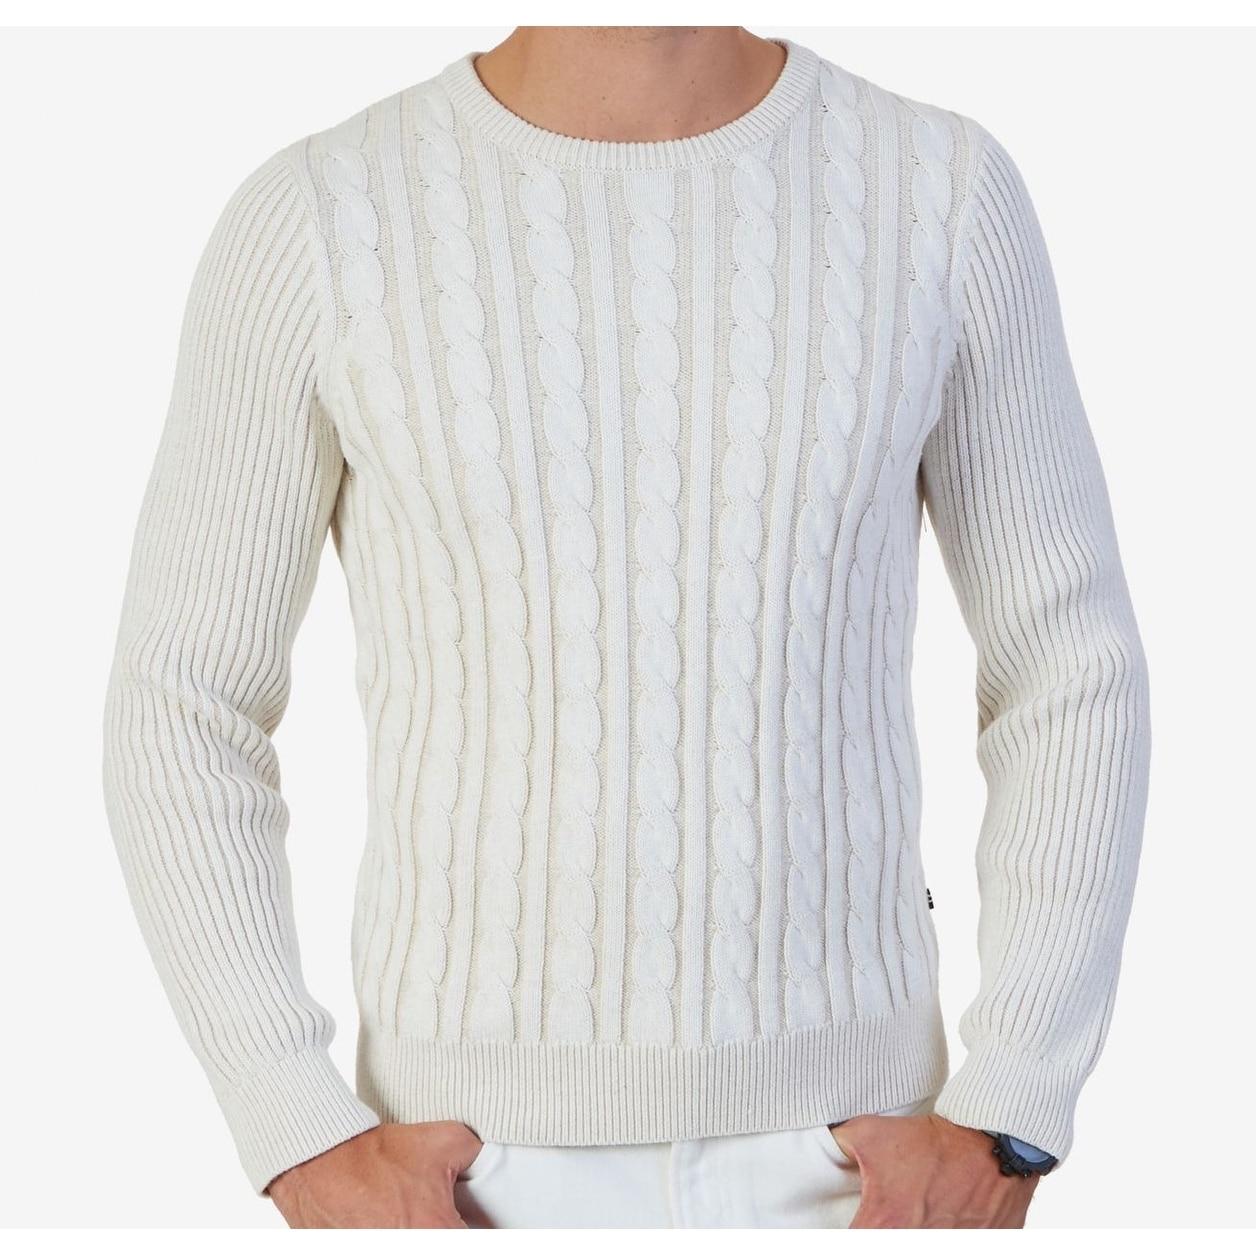 Nautica NEW White Mens Size Medium M Crewneck Cable Knit Sweater